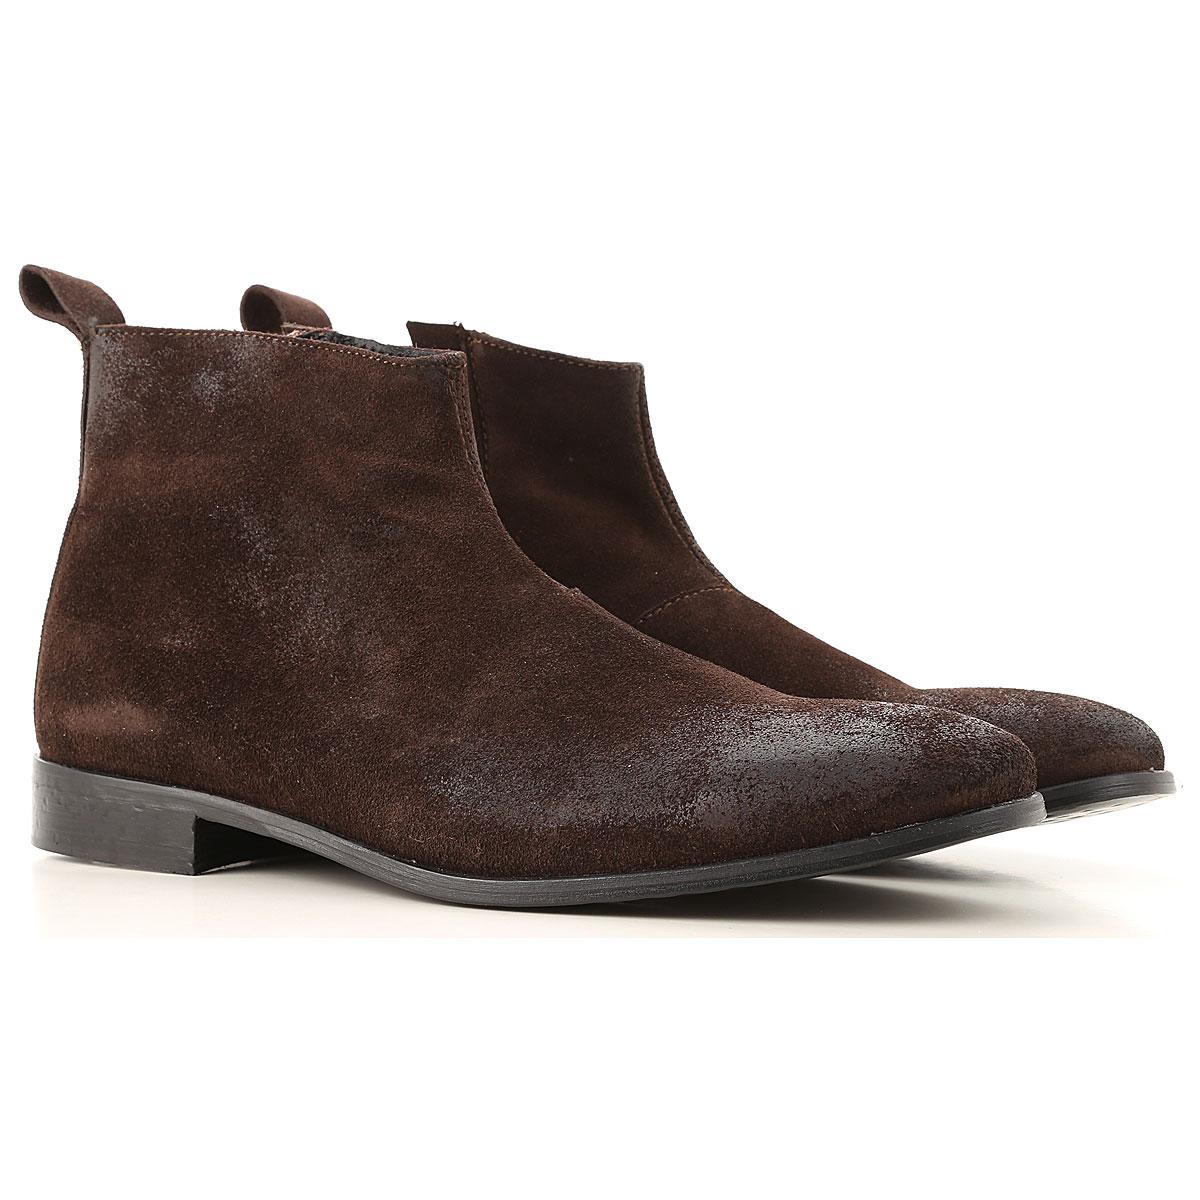 Daniele Alessandrini Desert Boots Chukka for Men On Sale, Dark Brown, Suede leather, 2019, 10 7.5 8 9